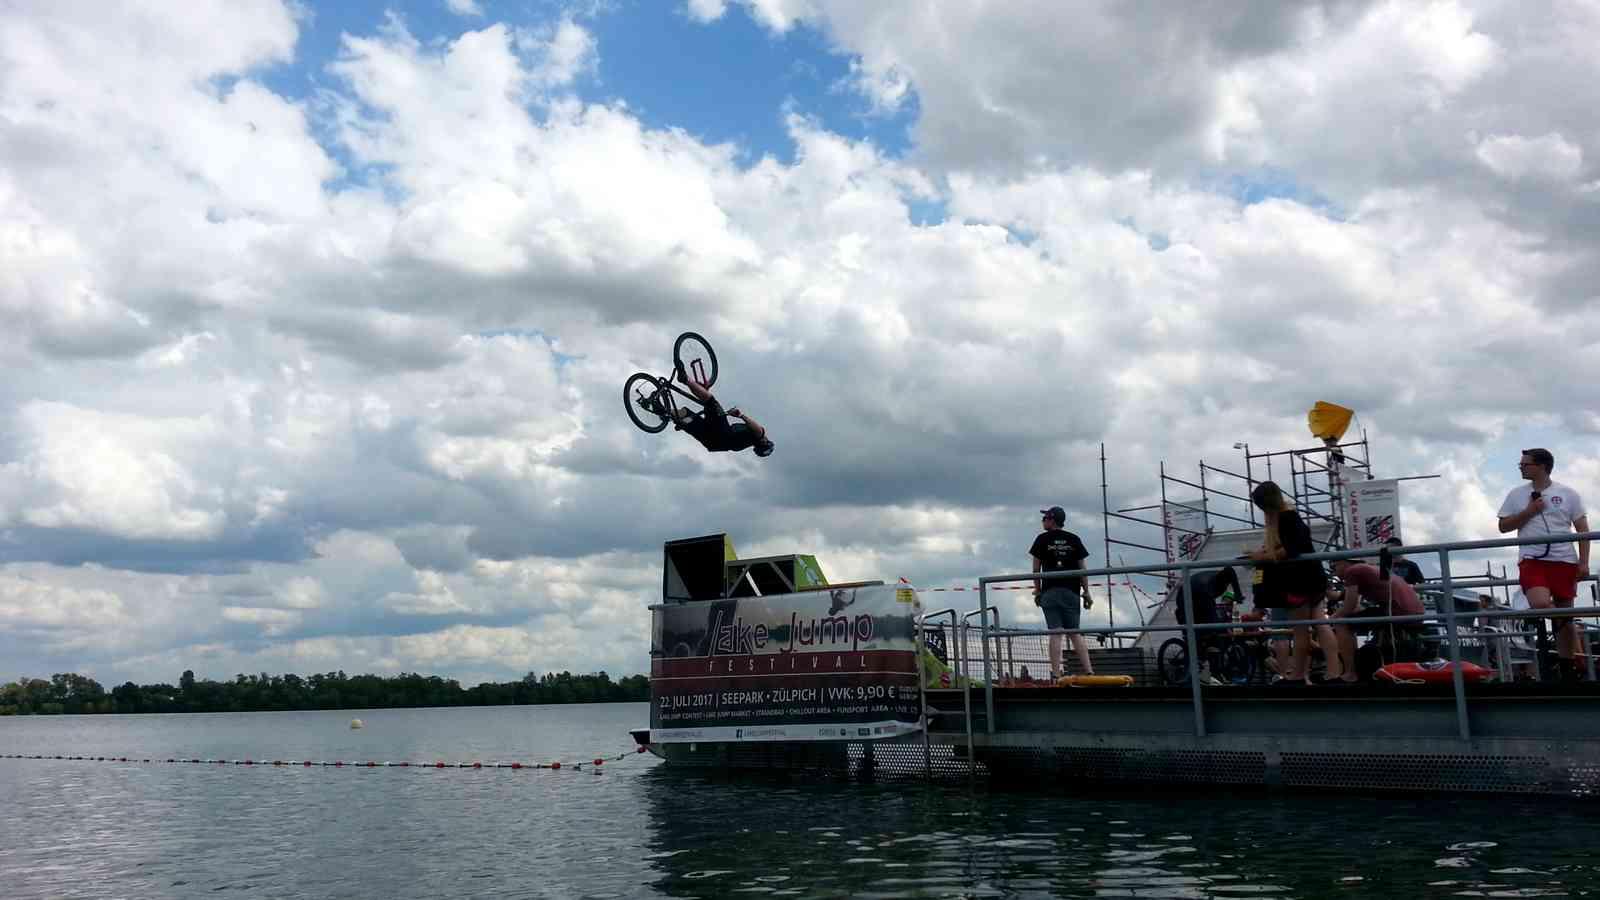 Lake Jump Festival Turbomatik 05